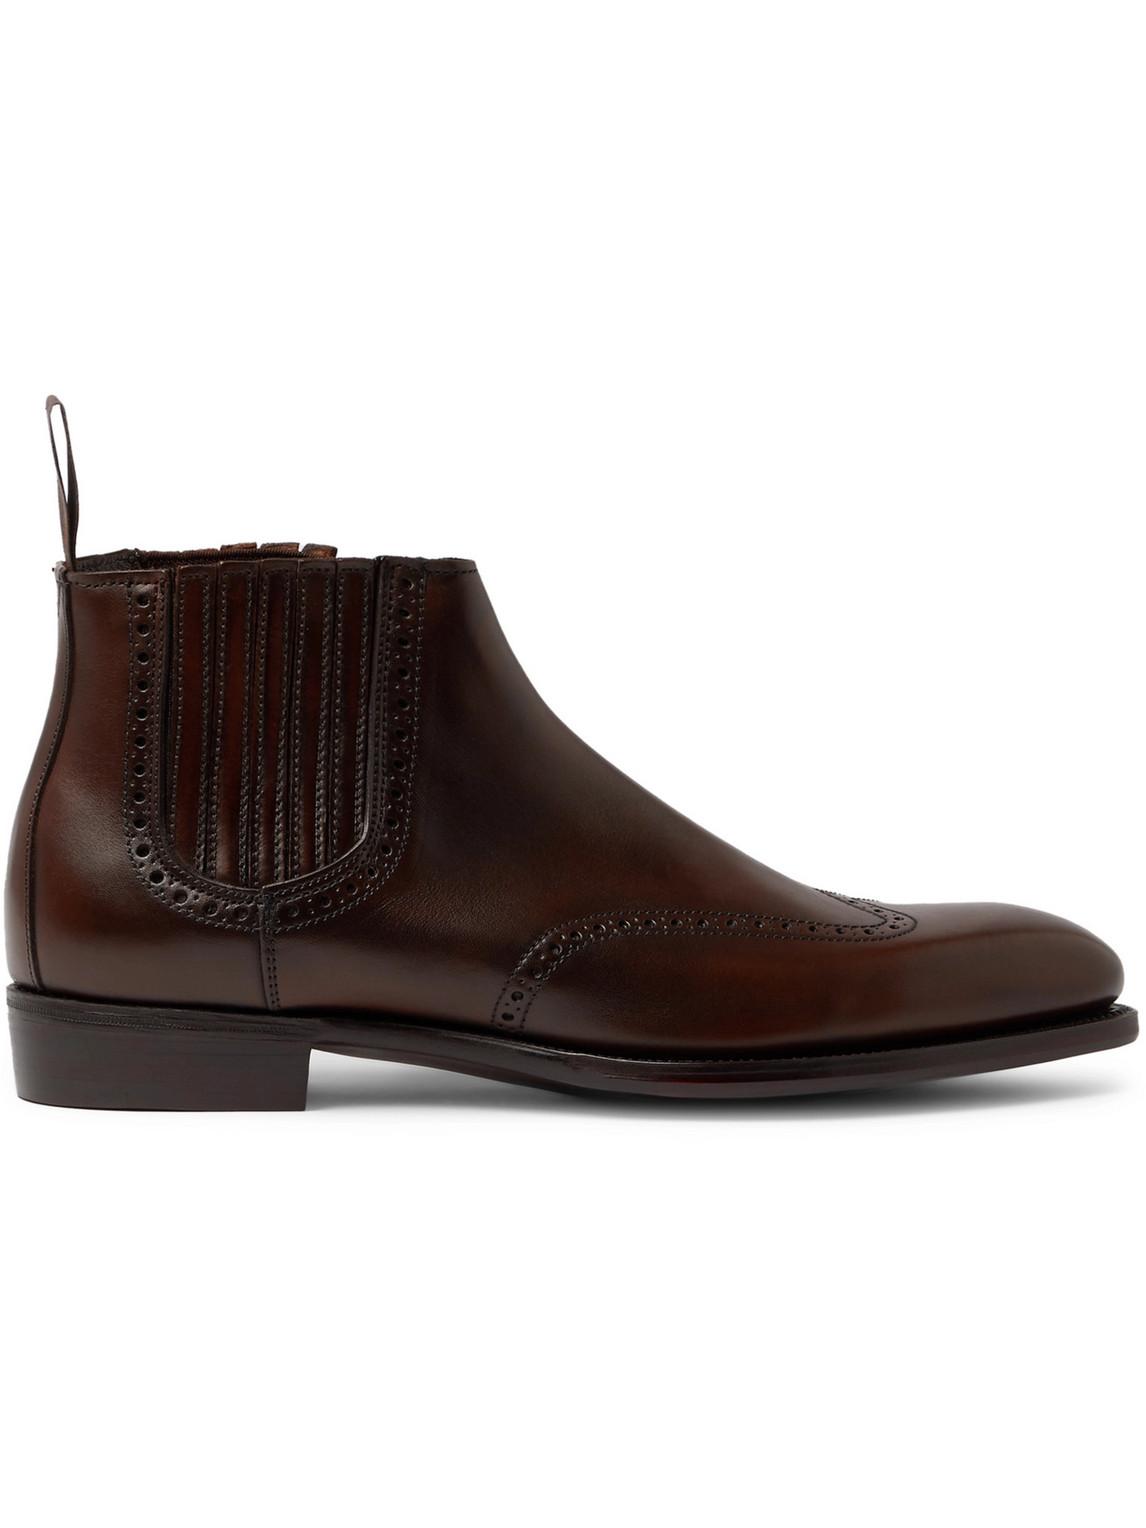 Kingsman - George Cleverley Veronique Leather Brogue Chelsea Boots - Men - Brown - Uk 7